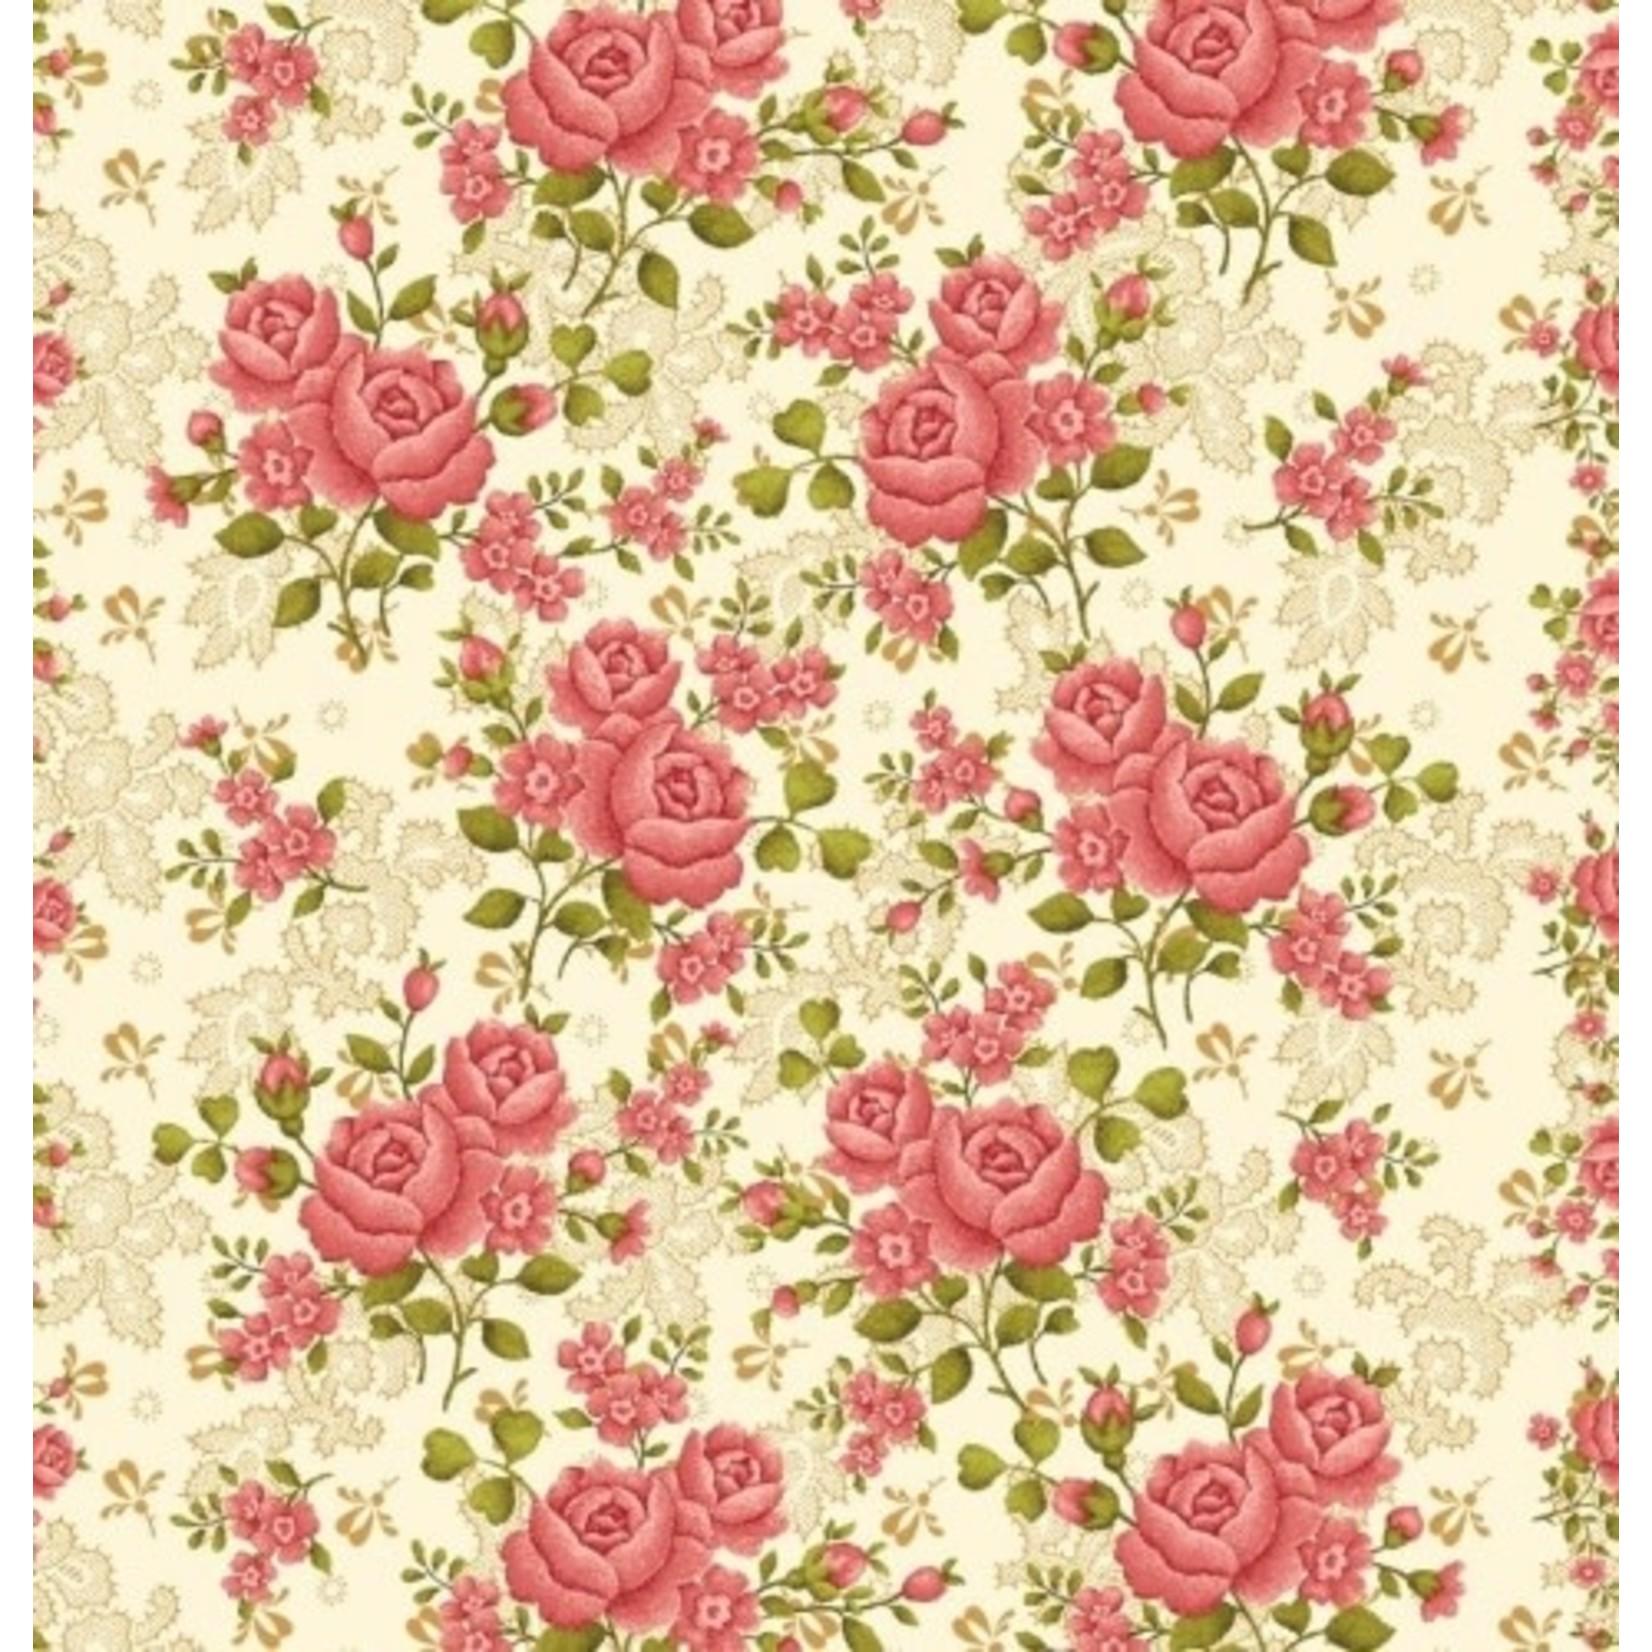 Benartex Studio Homestead Carriage - Climbing Rose - Ivory/Pink